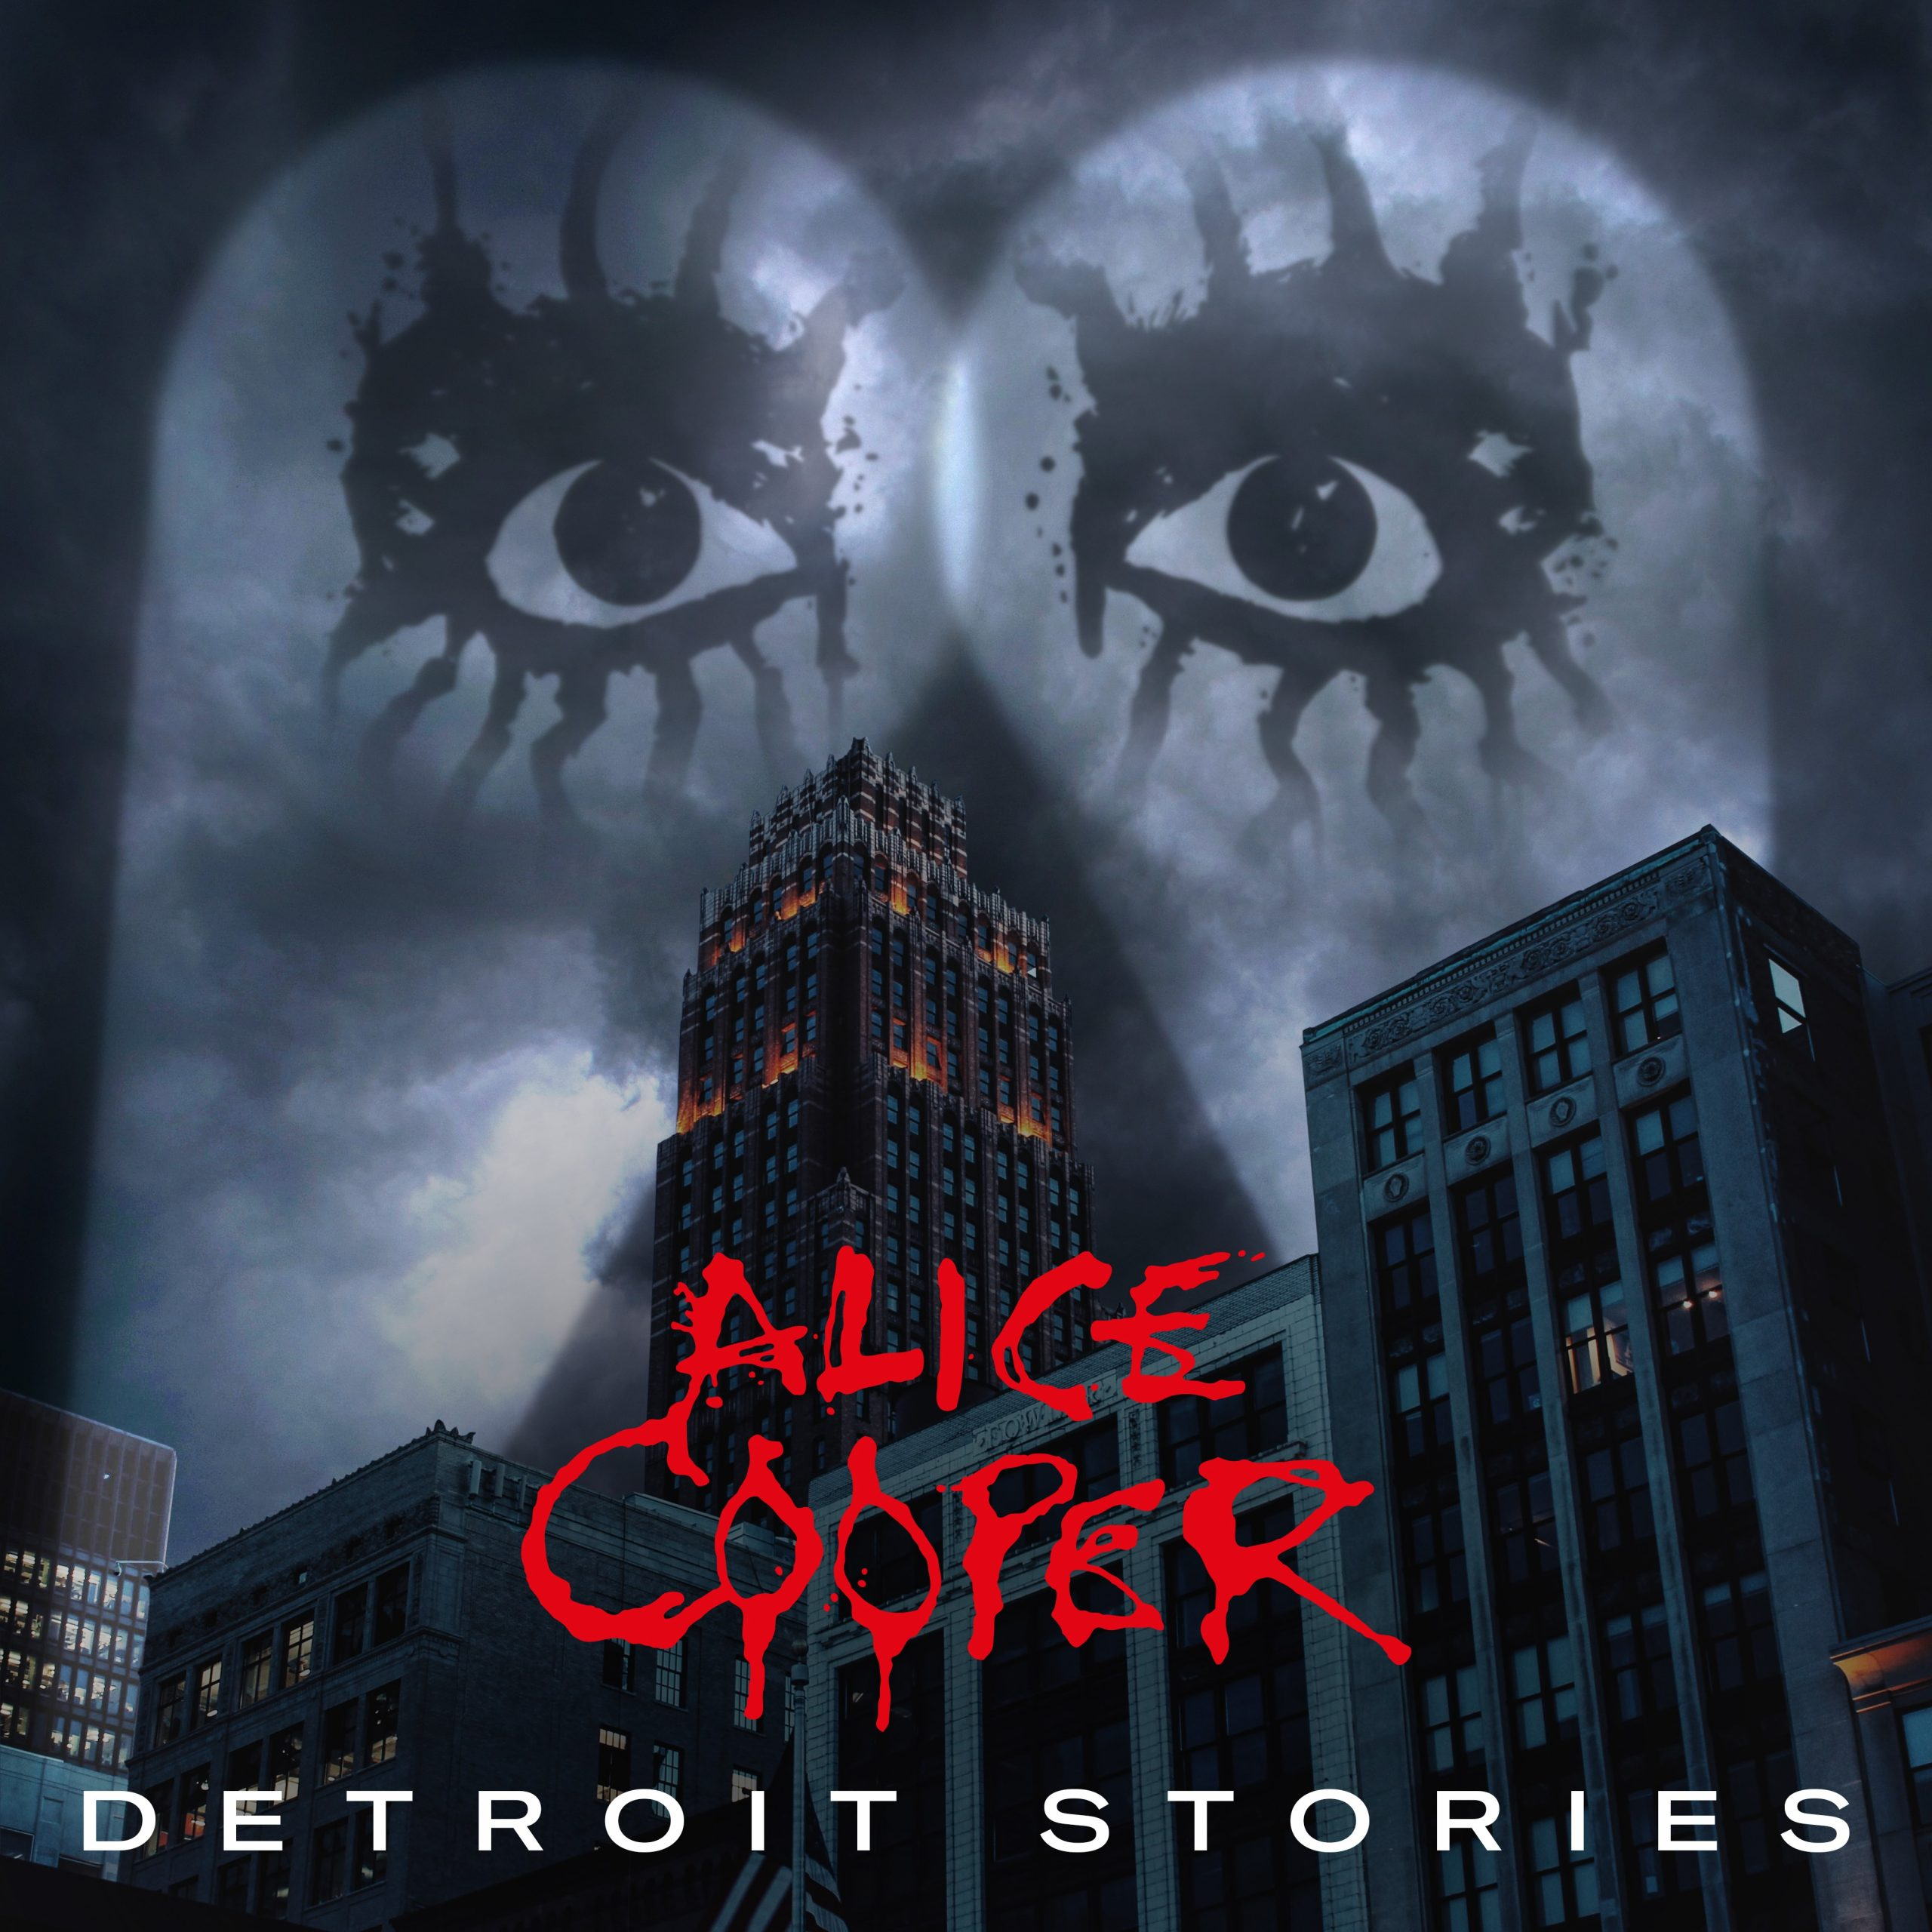 alice-cooper-detroit-stories-ein-album-review